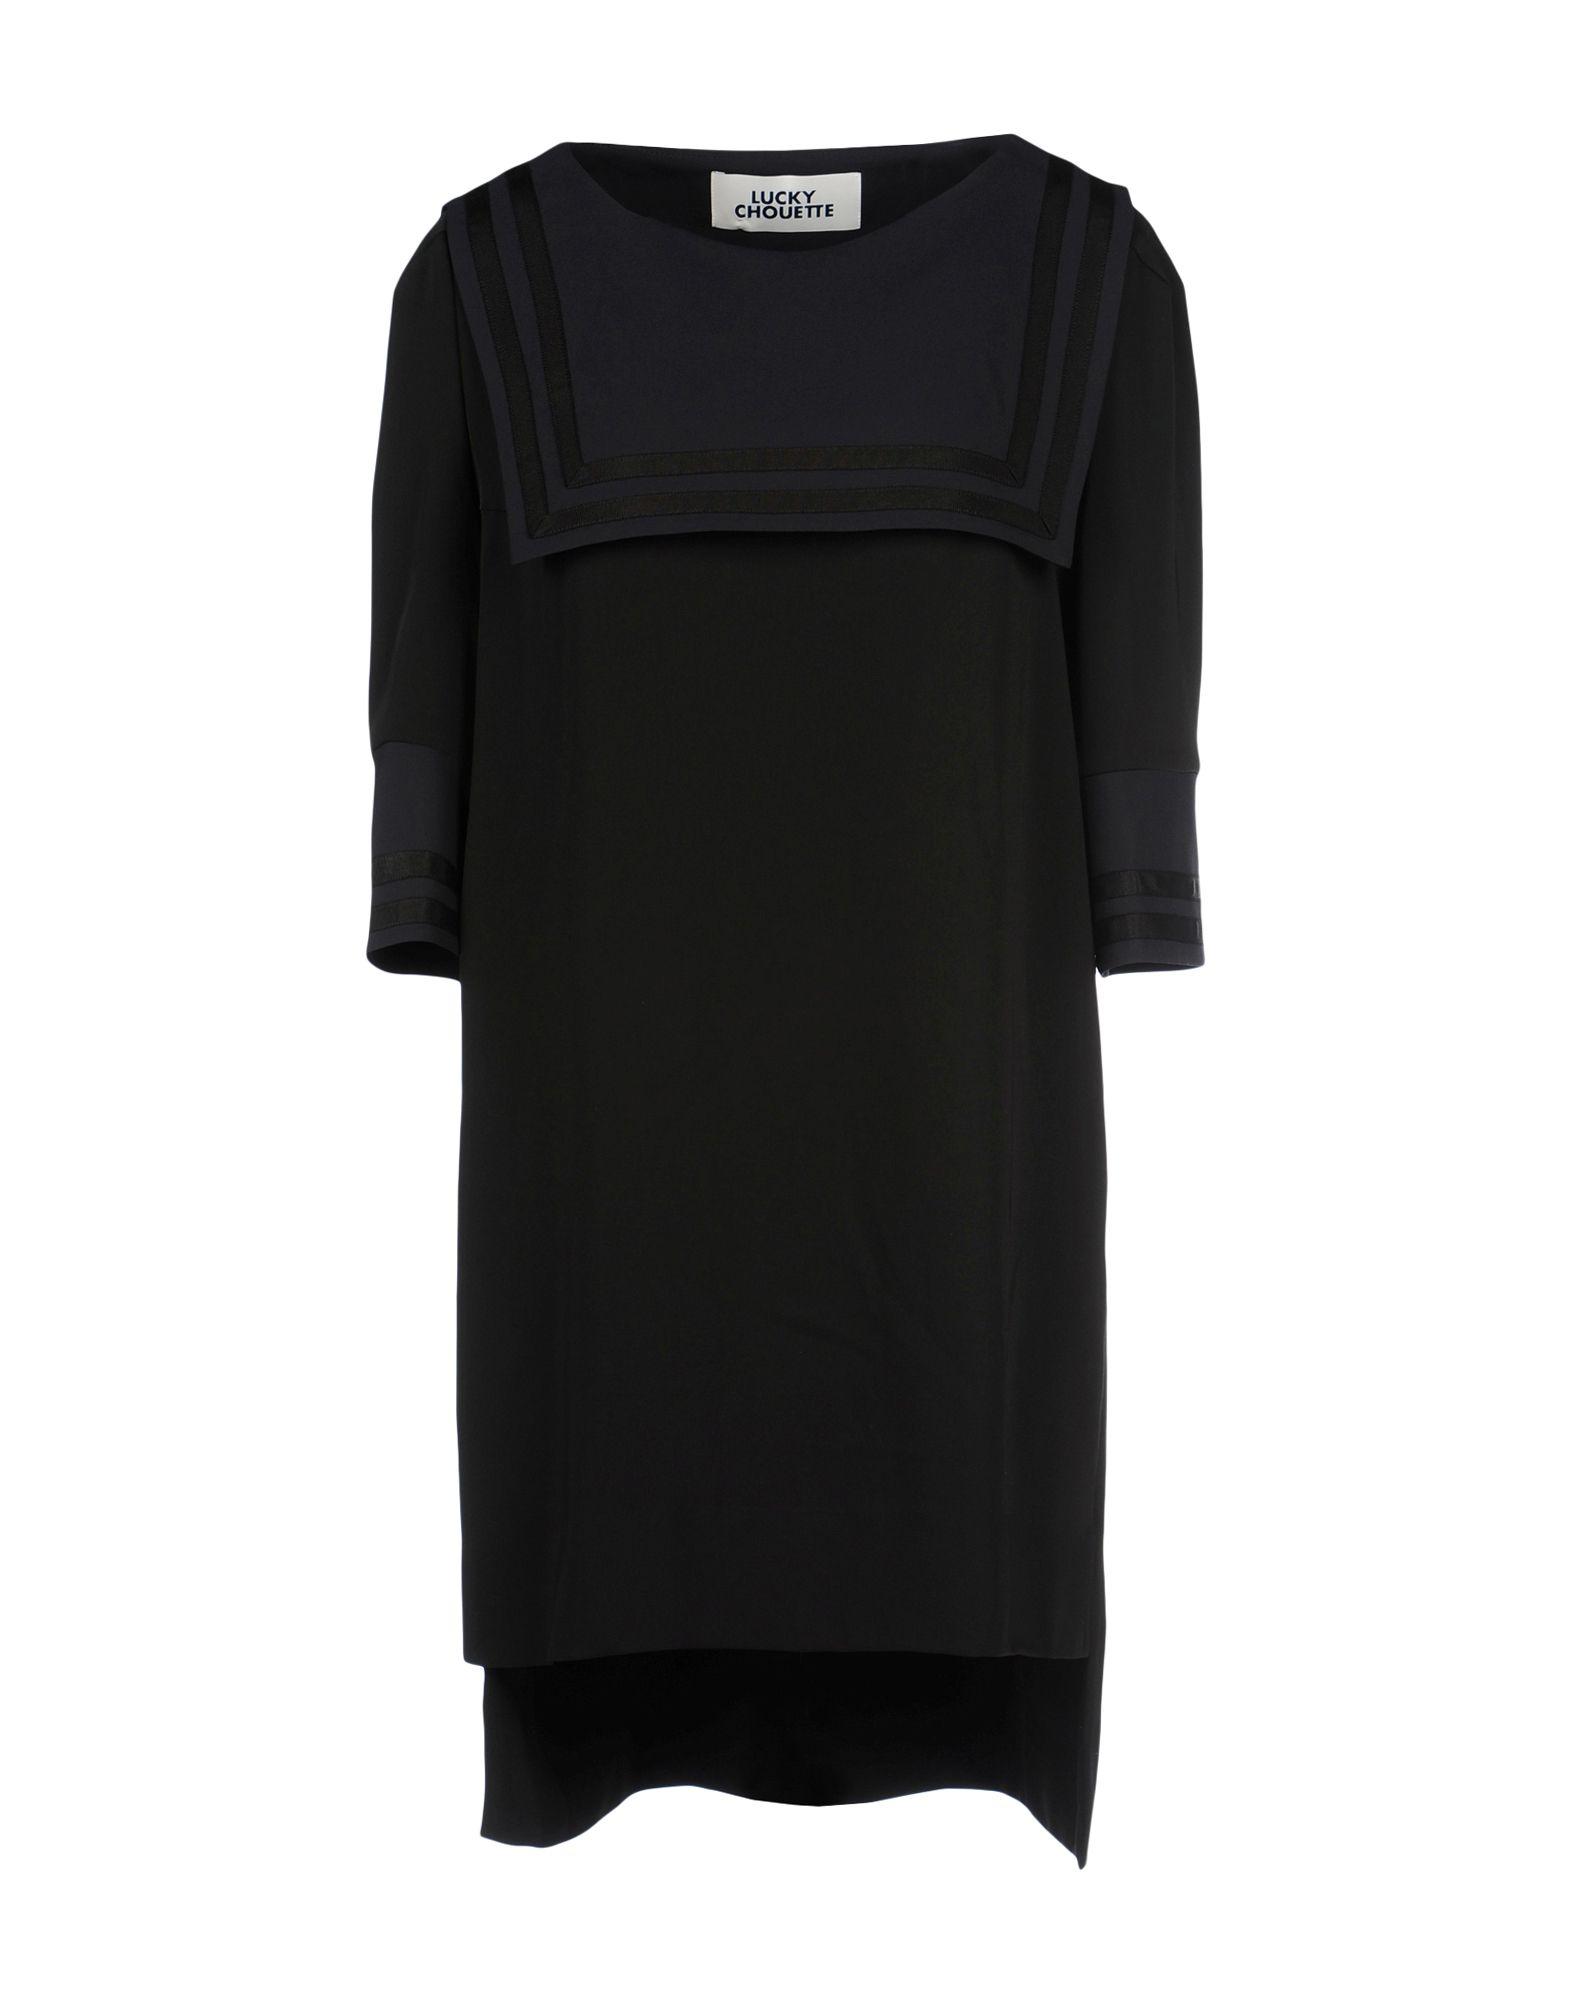 LUCKY CHOUETTE Короткое платье